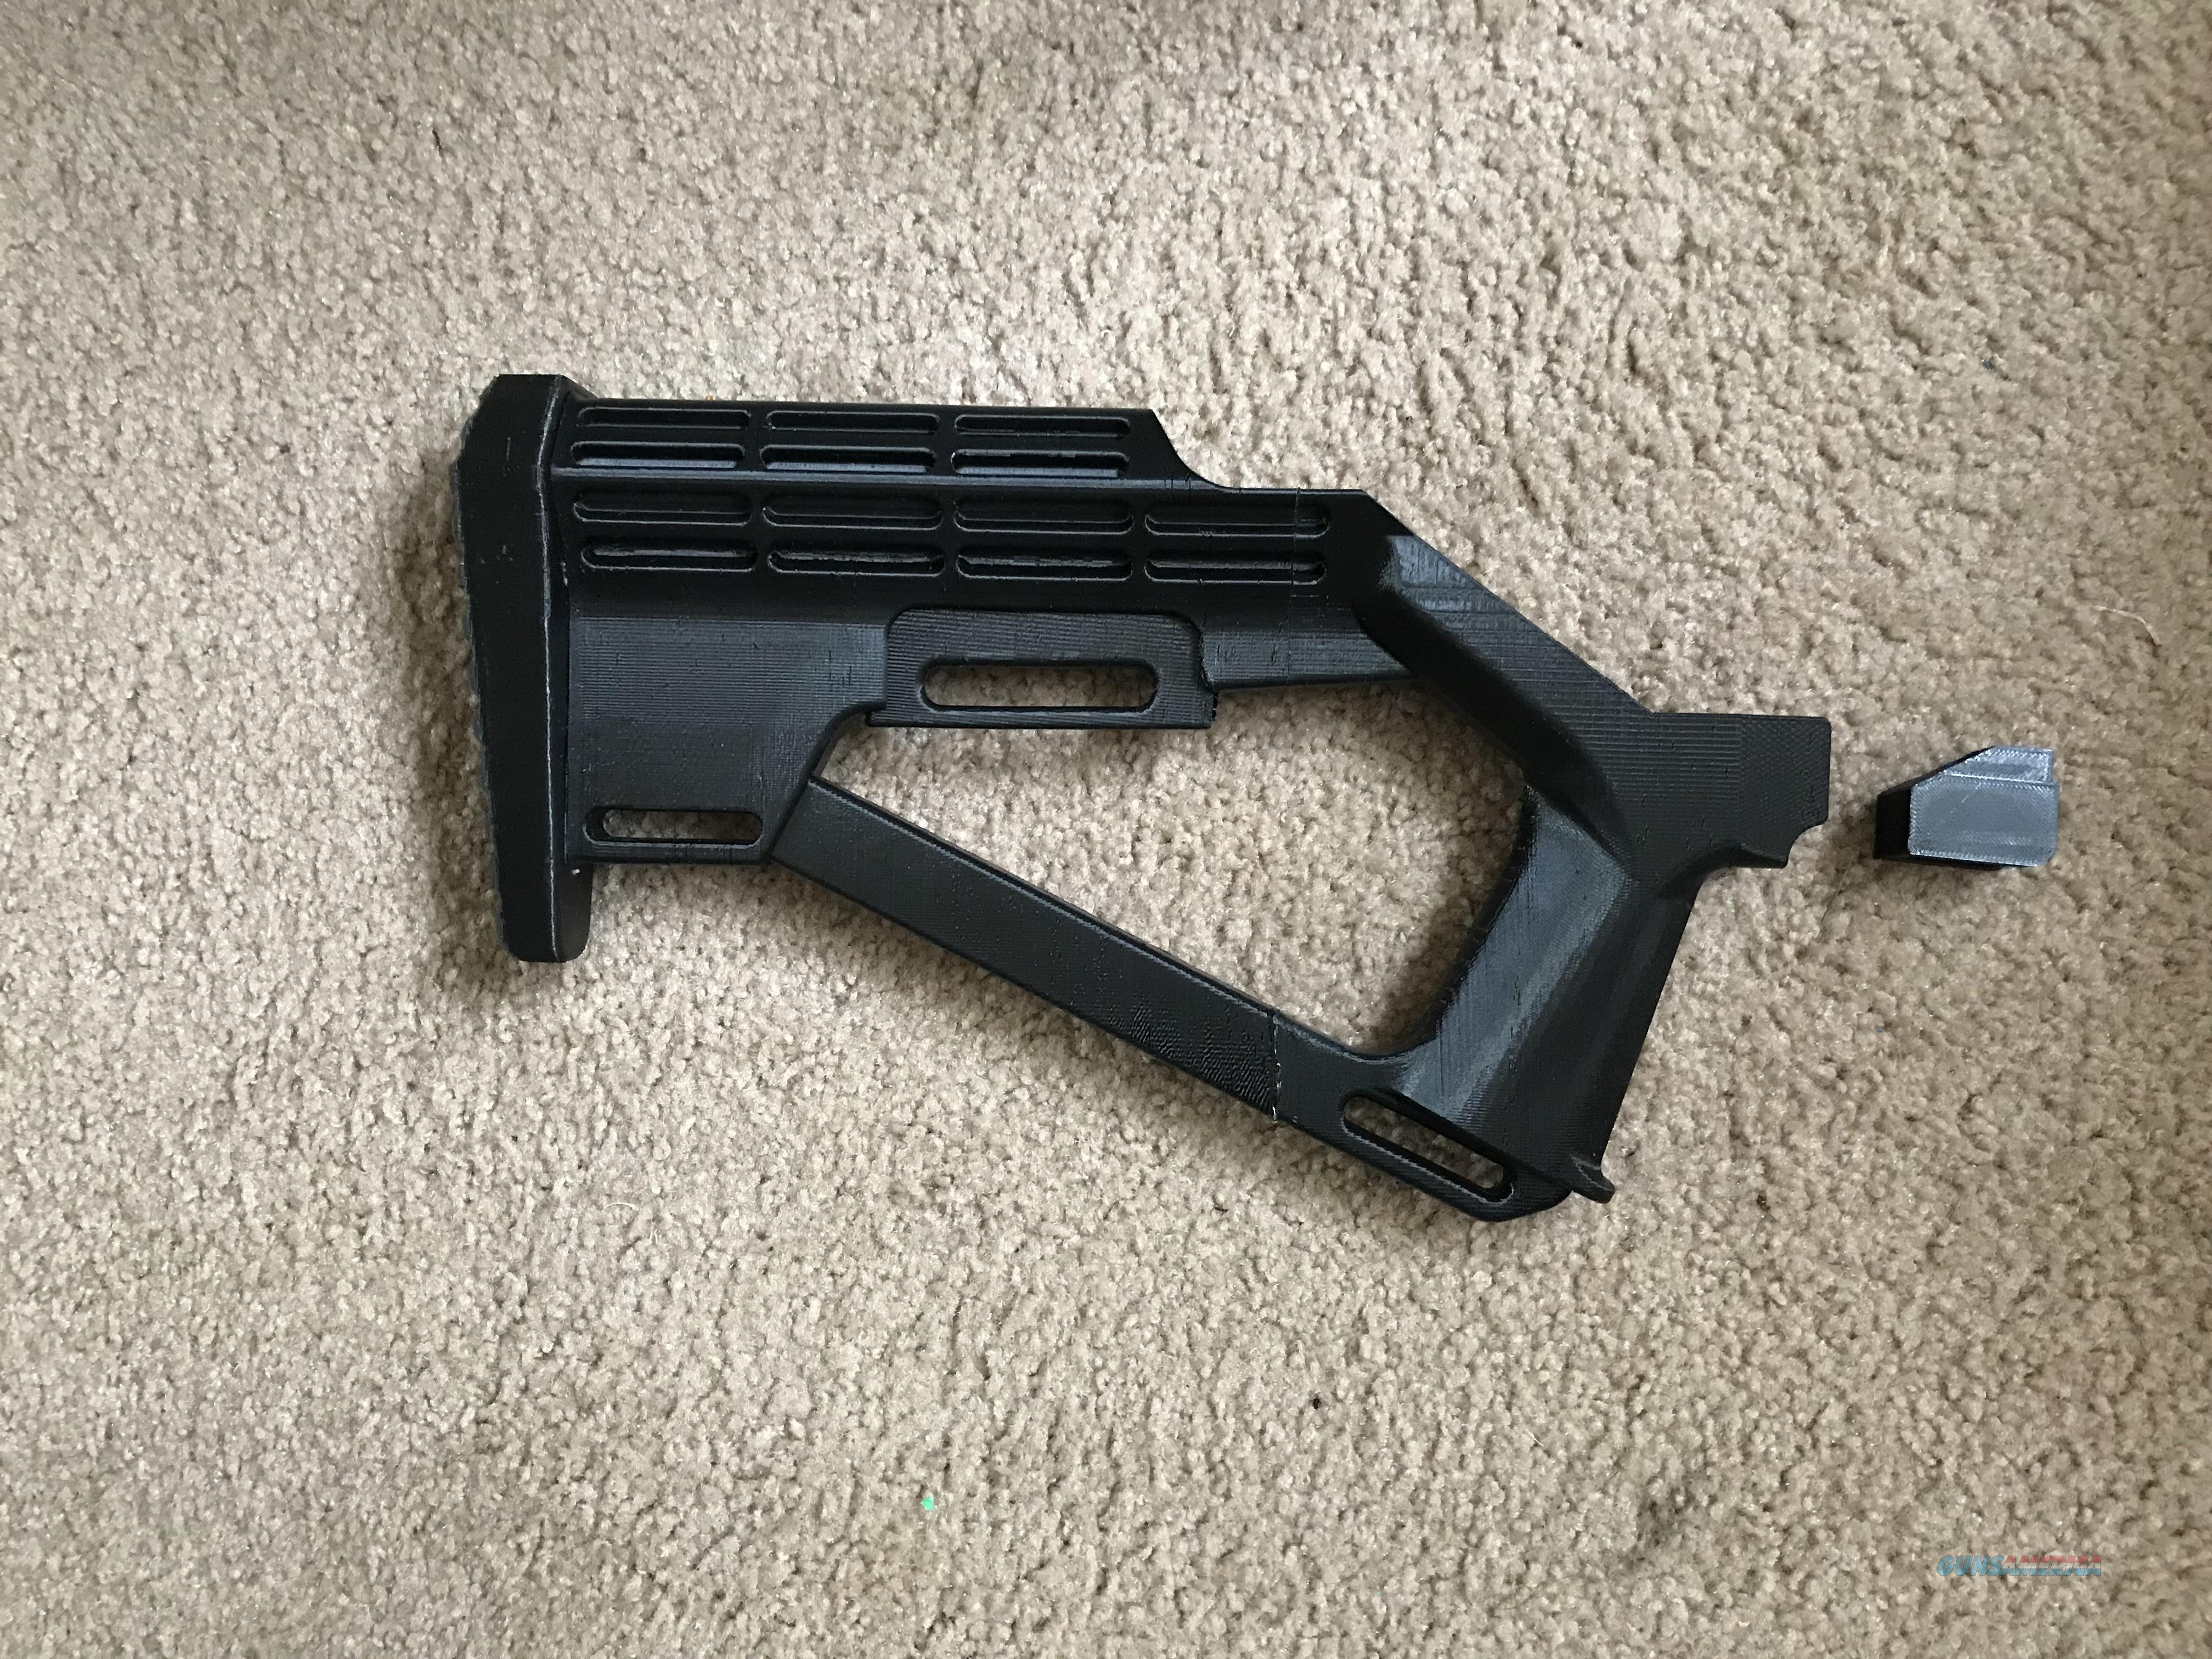 2 Disruptive Solutions Bump Fire Stocks  AR-15 3D Printed Right or Left Handed, Black  Non-Guns > Gunstocks, Grips & Wood